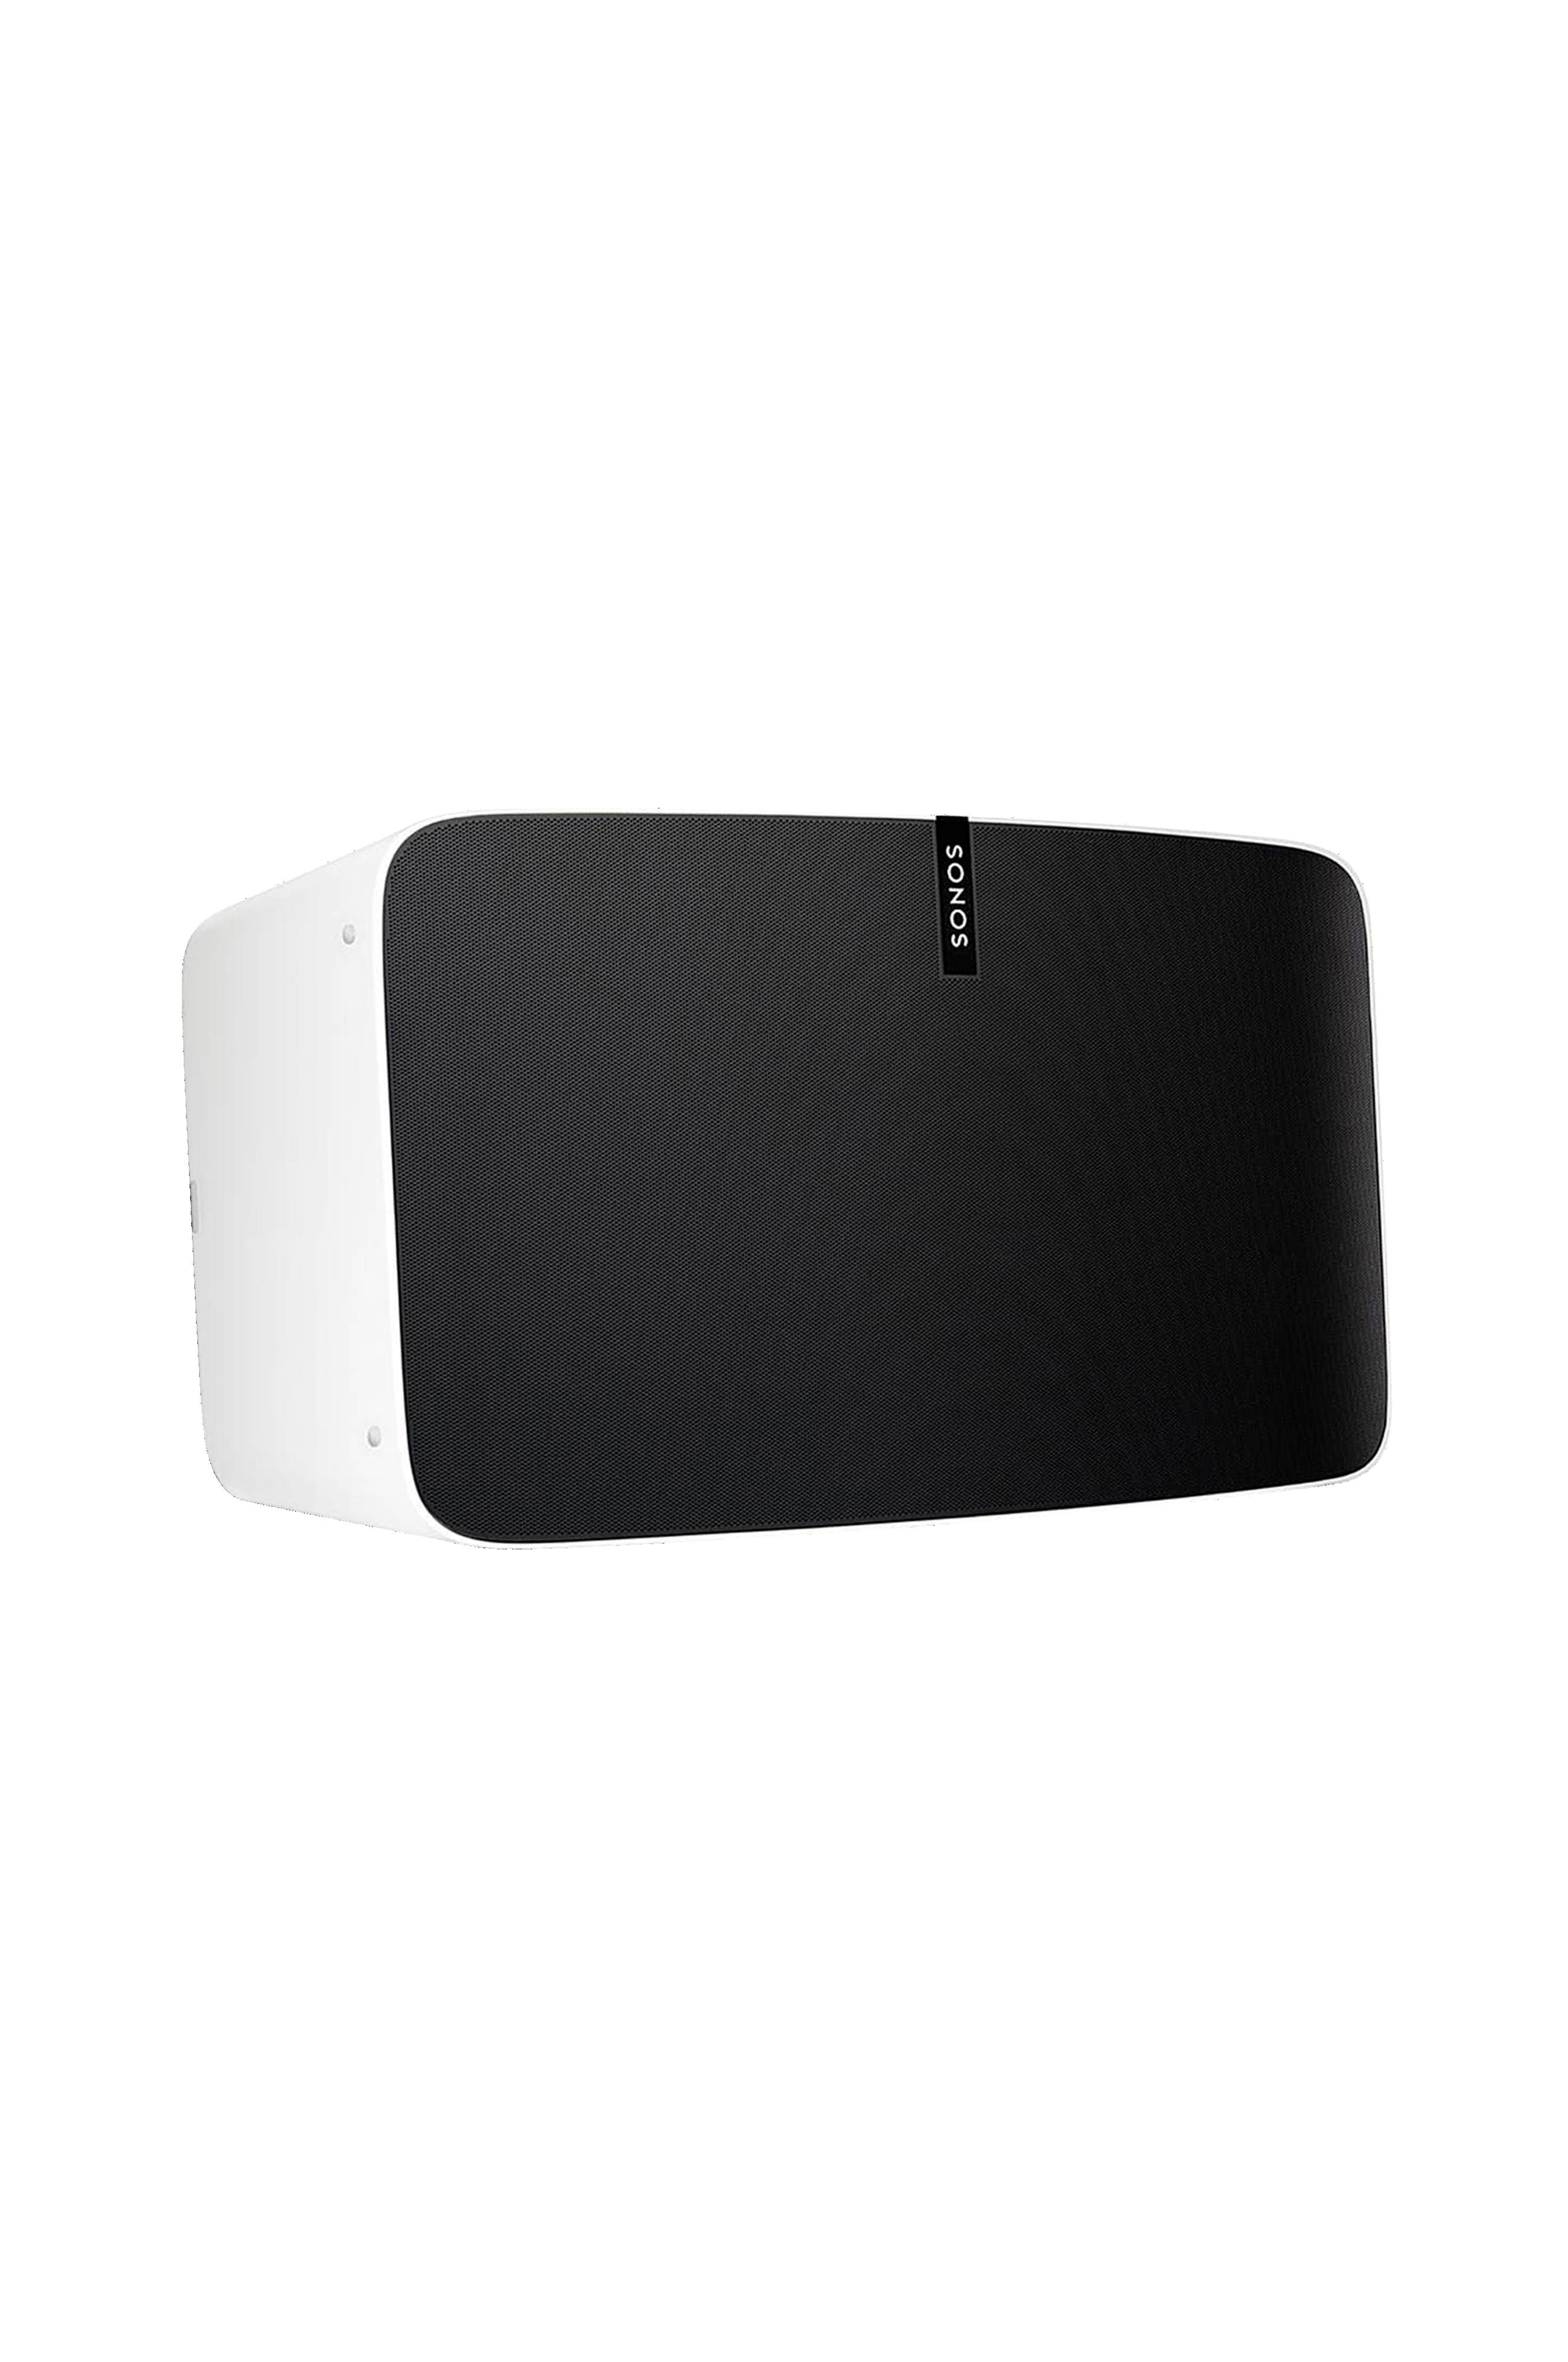 Sonos Play 5 Gen2 Vit - Elektronik - Ellos.se 7c3c3ffc45d45